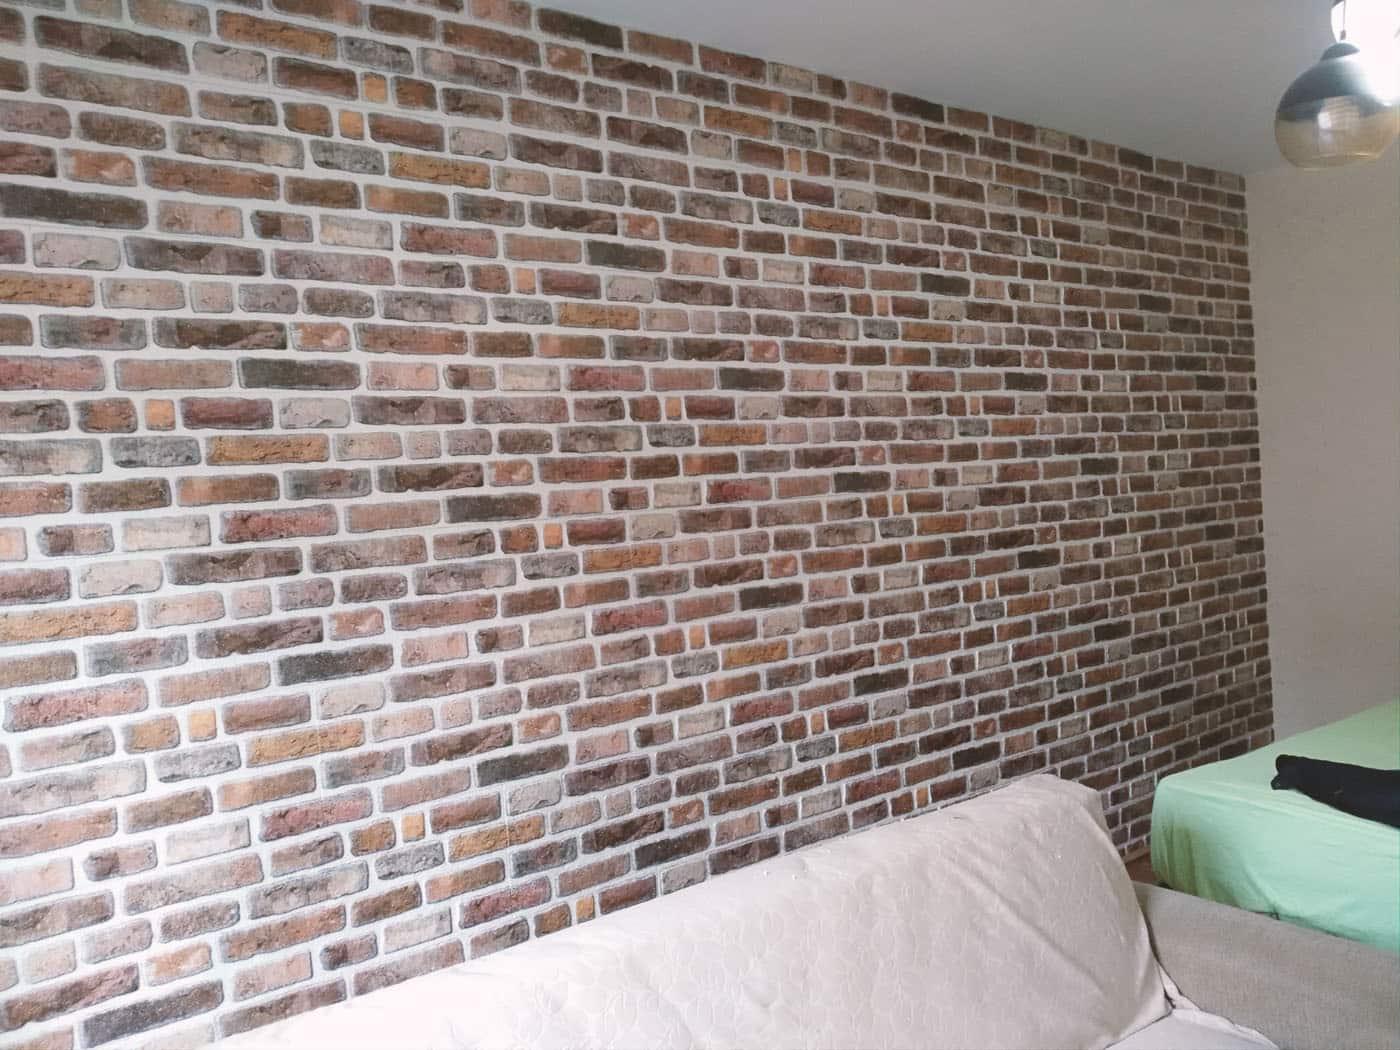 Wandverkleidung Backsteinoptik 651-002